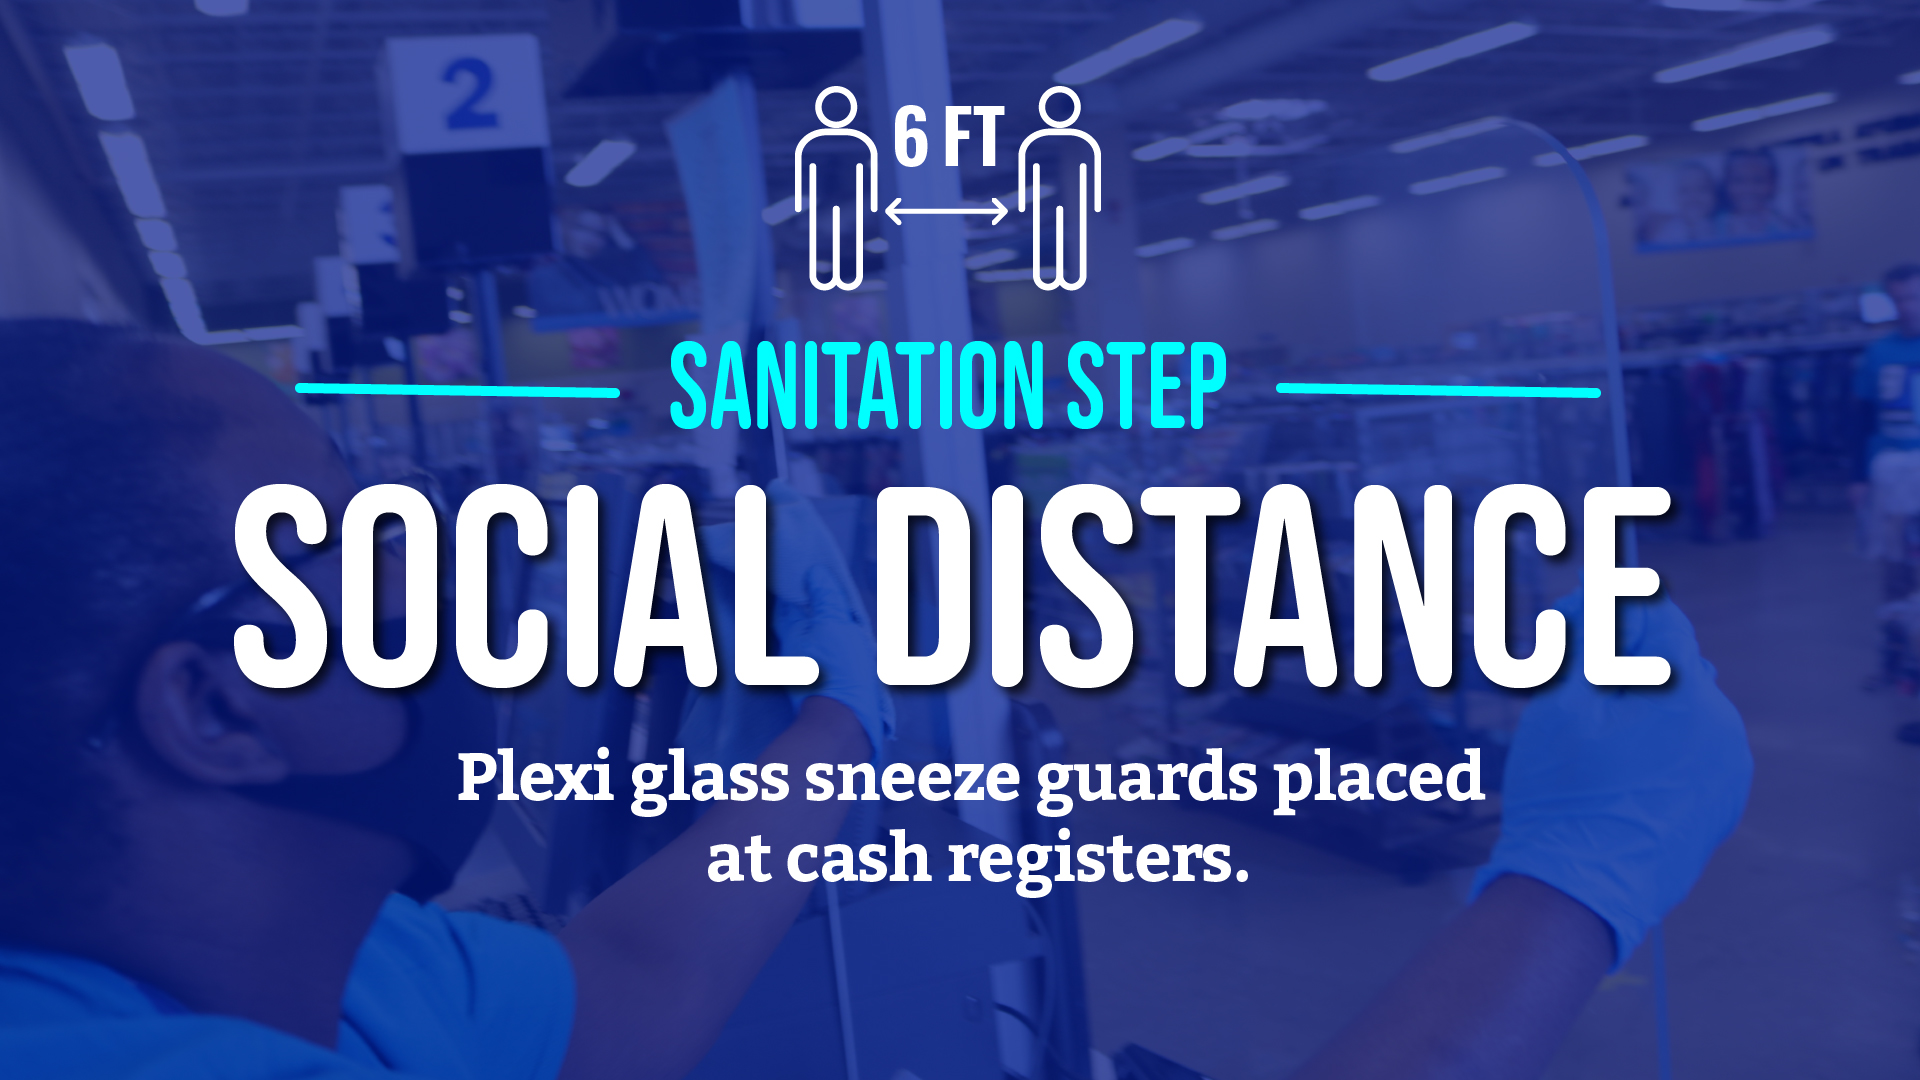 1920x1080-Sanitation-Step_Social-Distance-Us_2